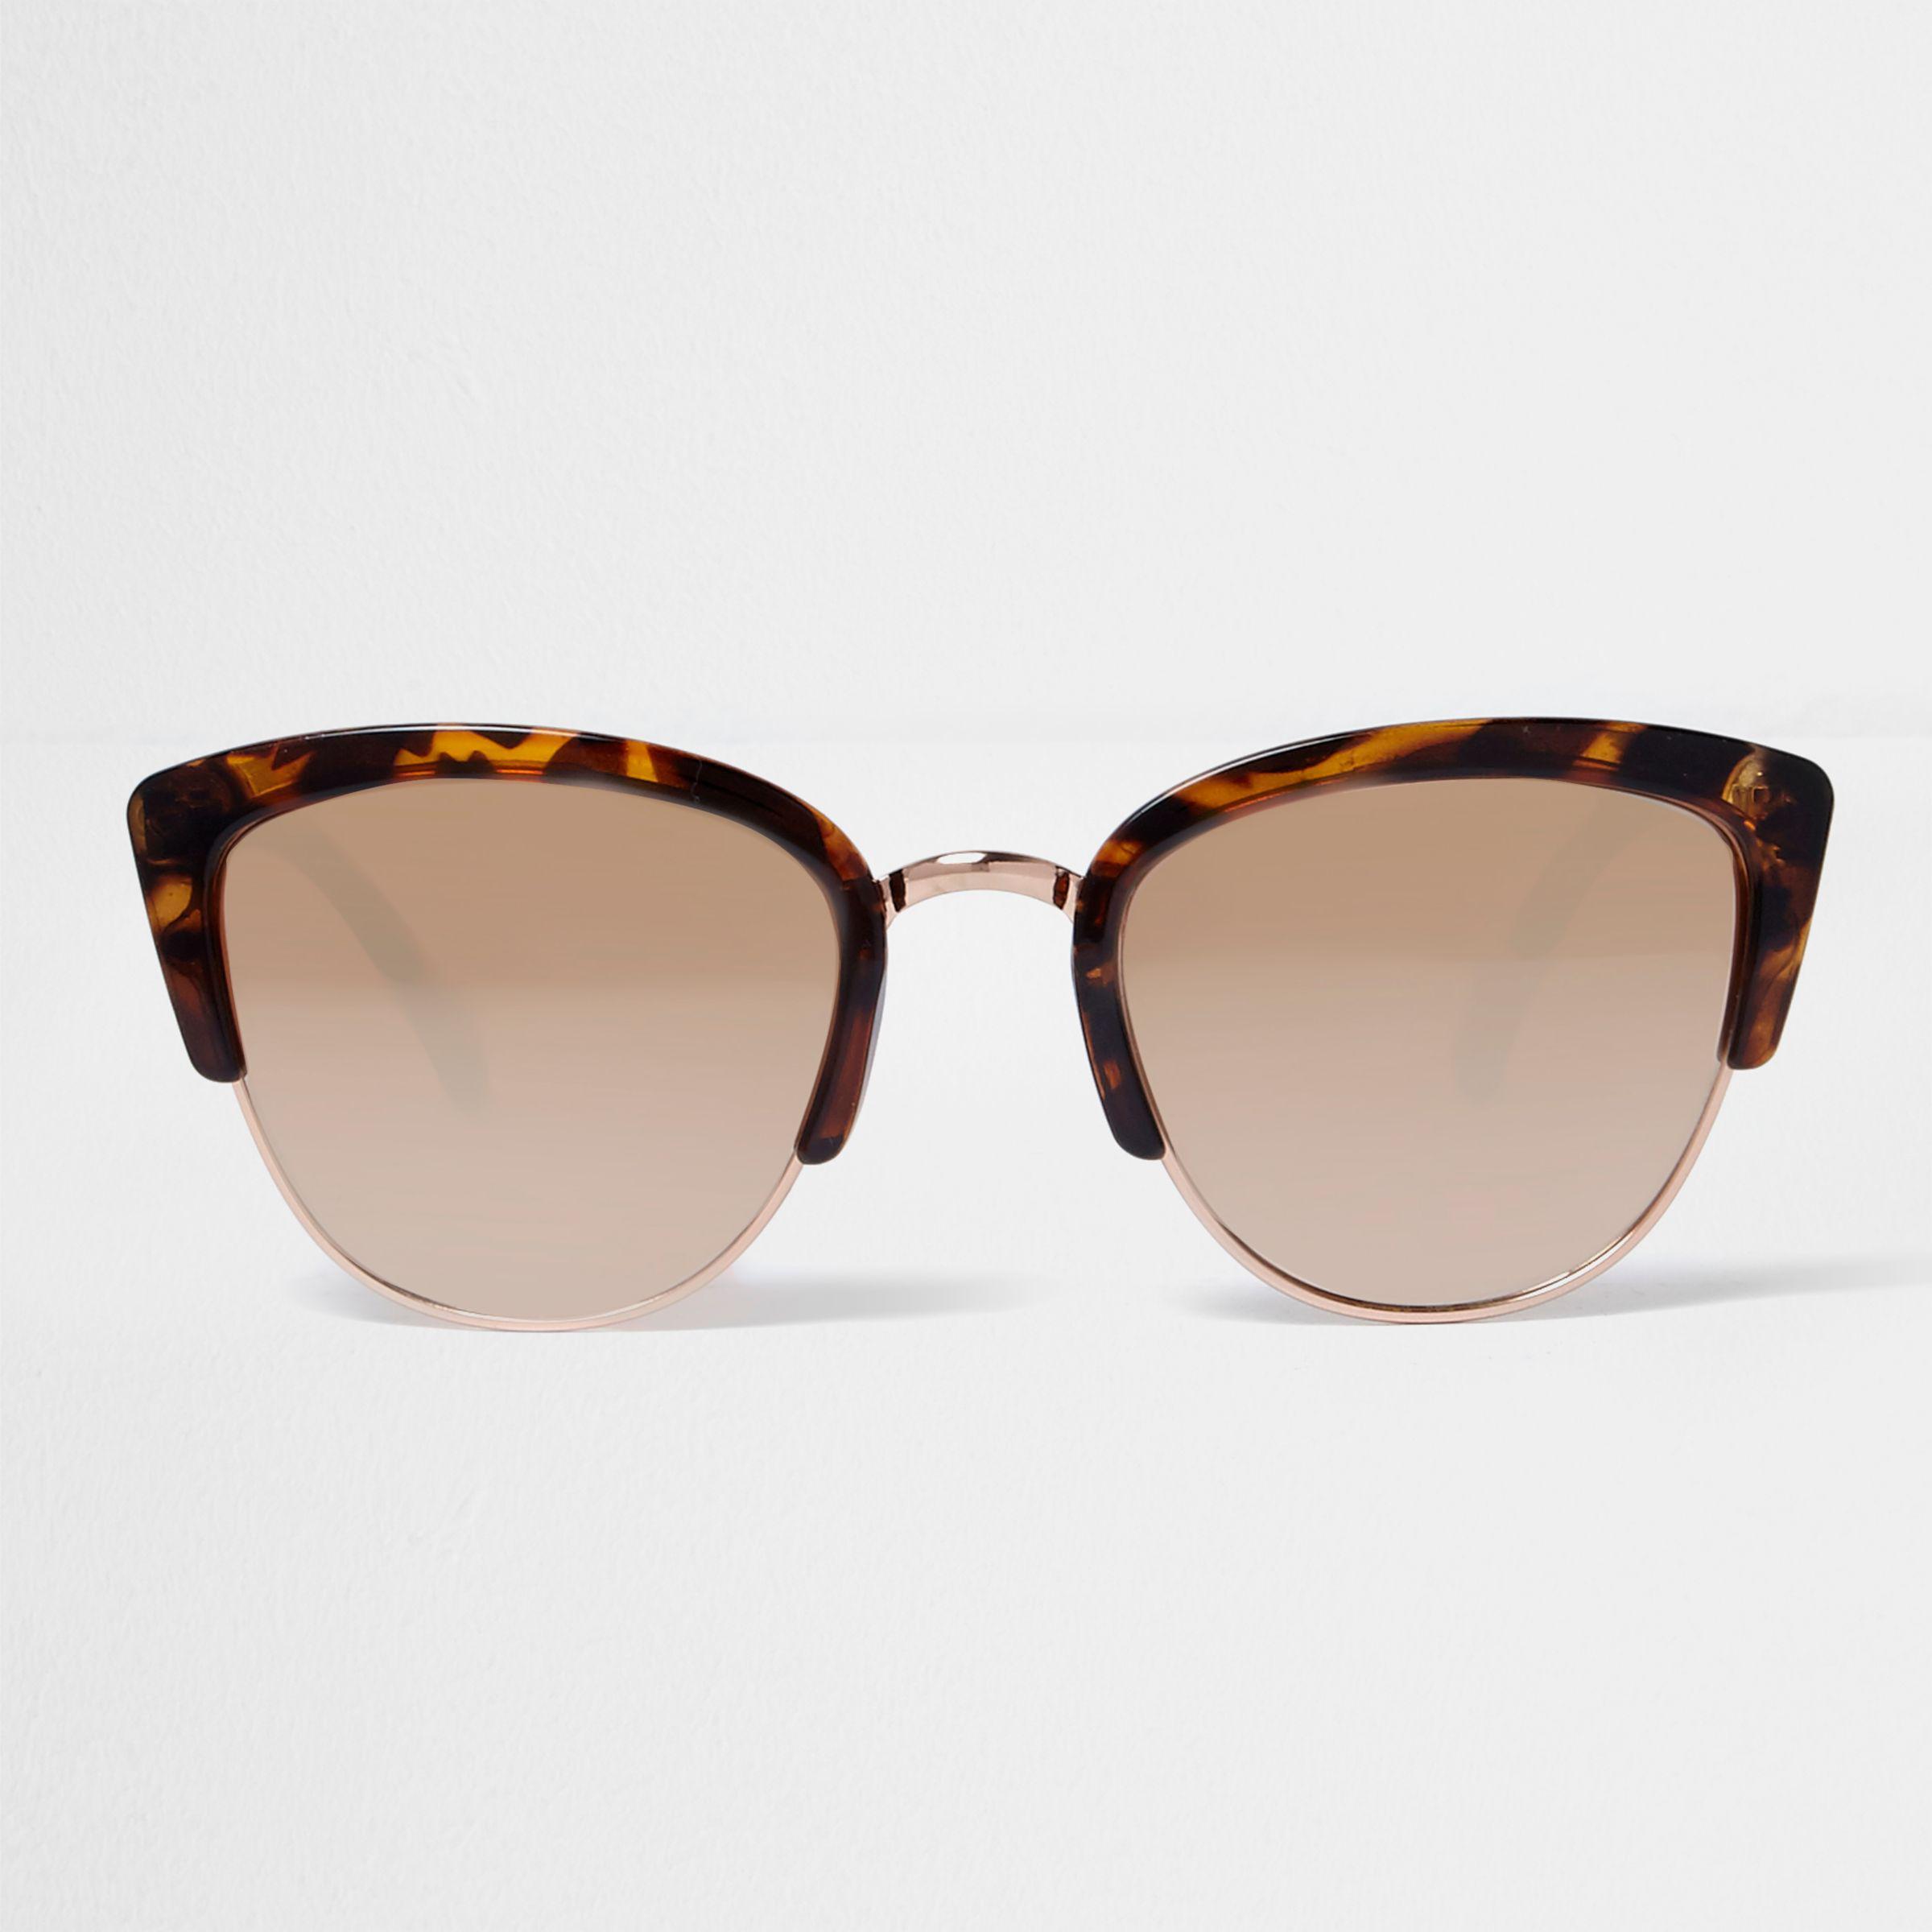 c46358cef9f River island brown leopard print mirror lens sunglasses in brown lyst jpg  2400x2400 Leopard trim mirror